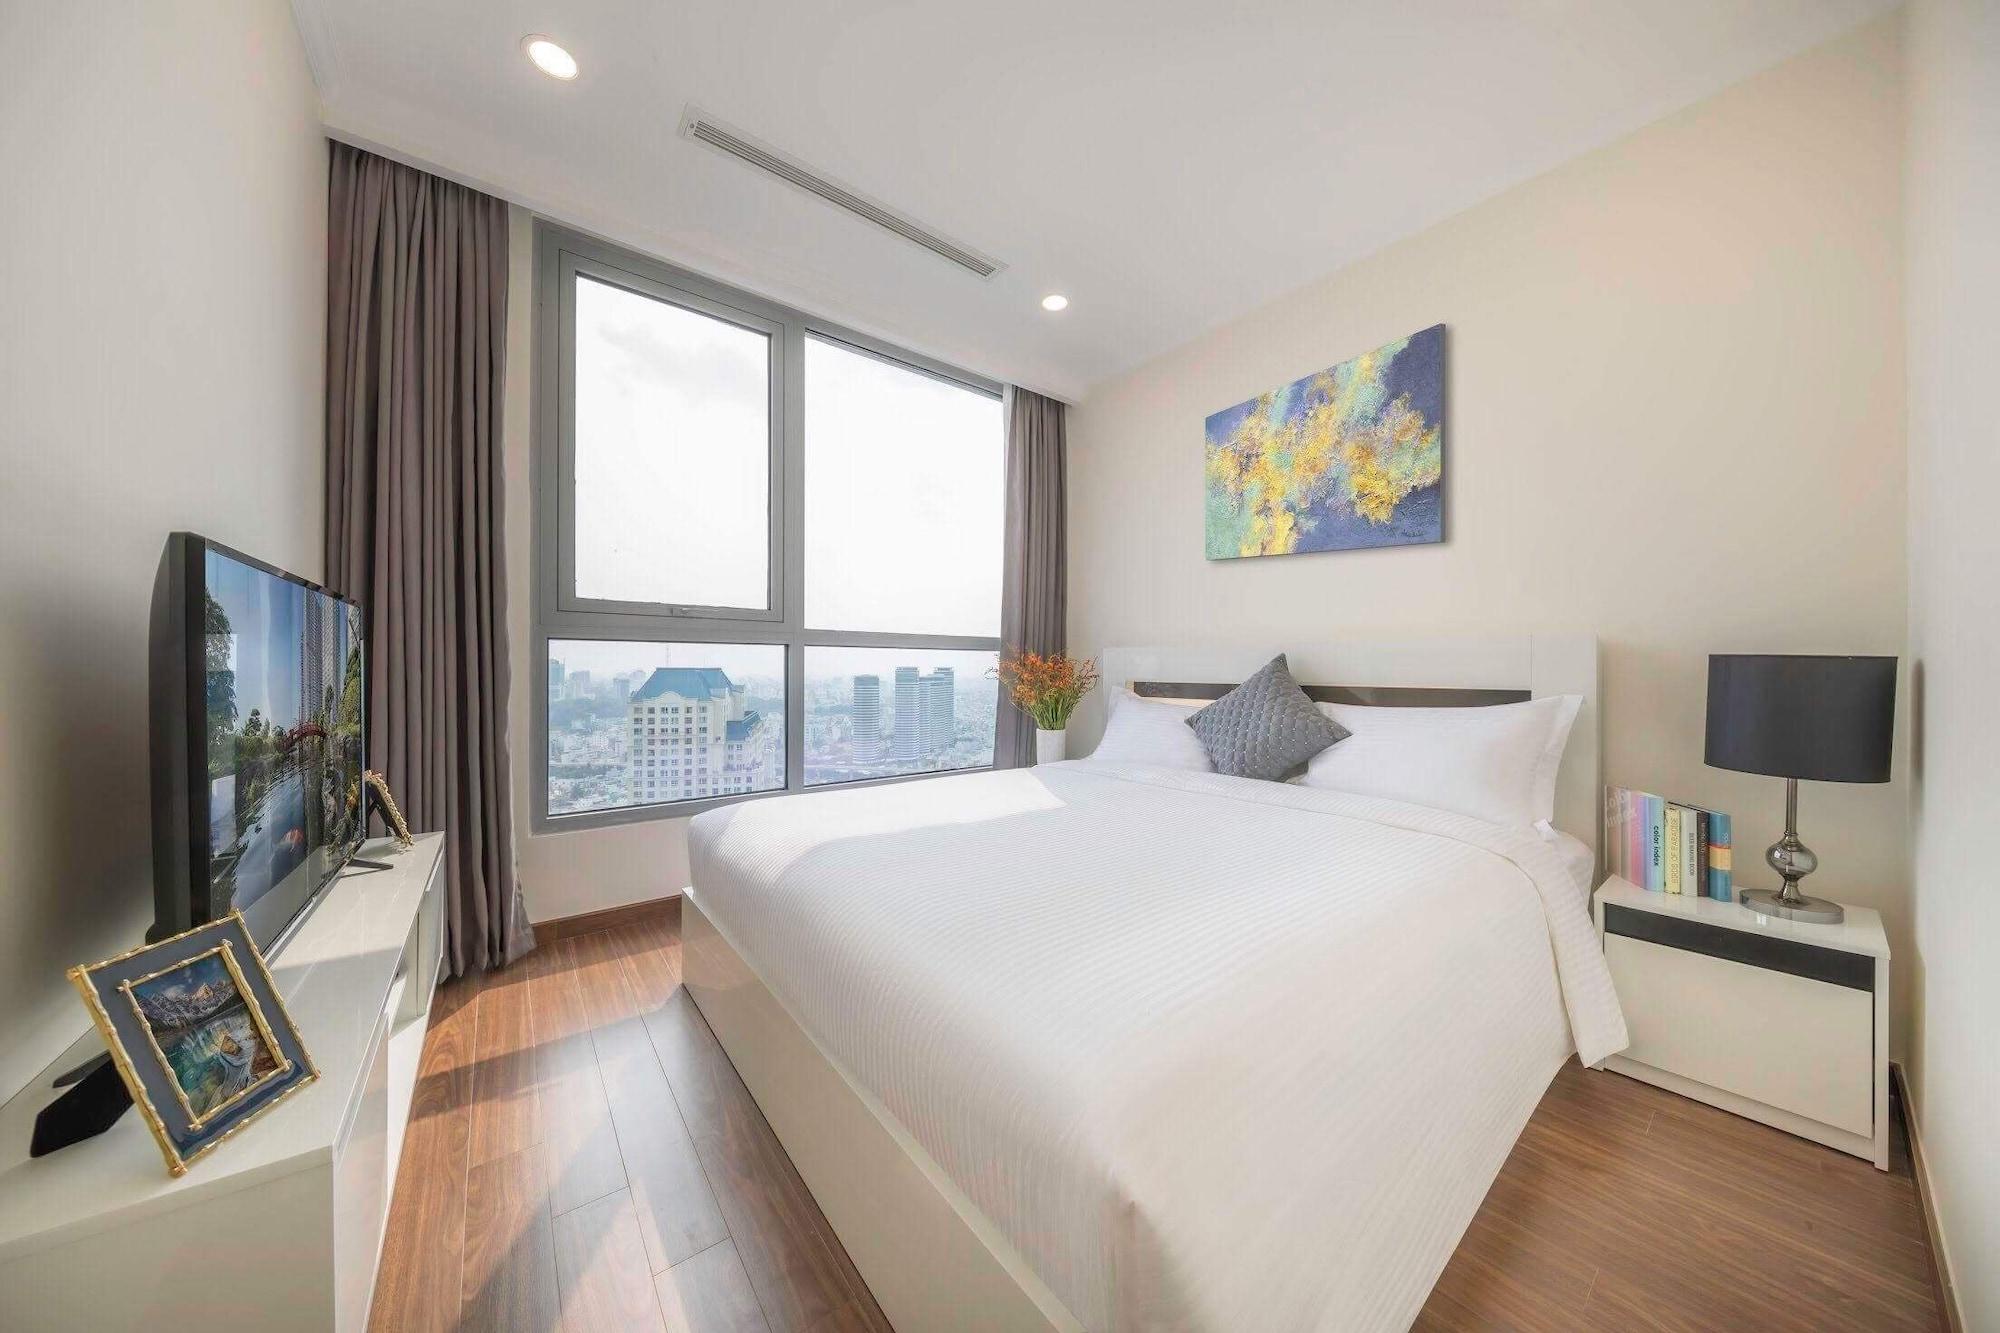 Christine's Saigon Apartment, Bình Thạnh